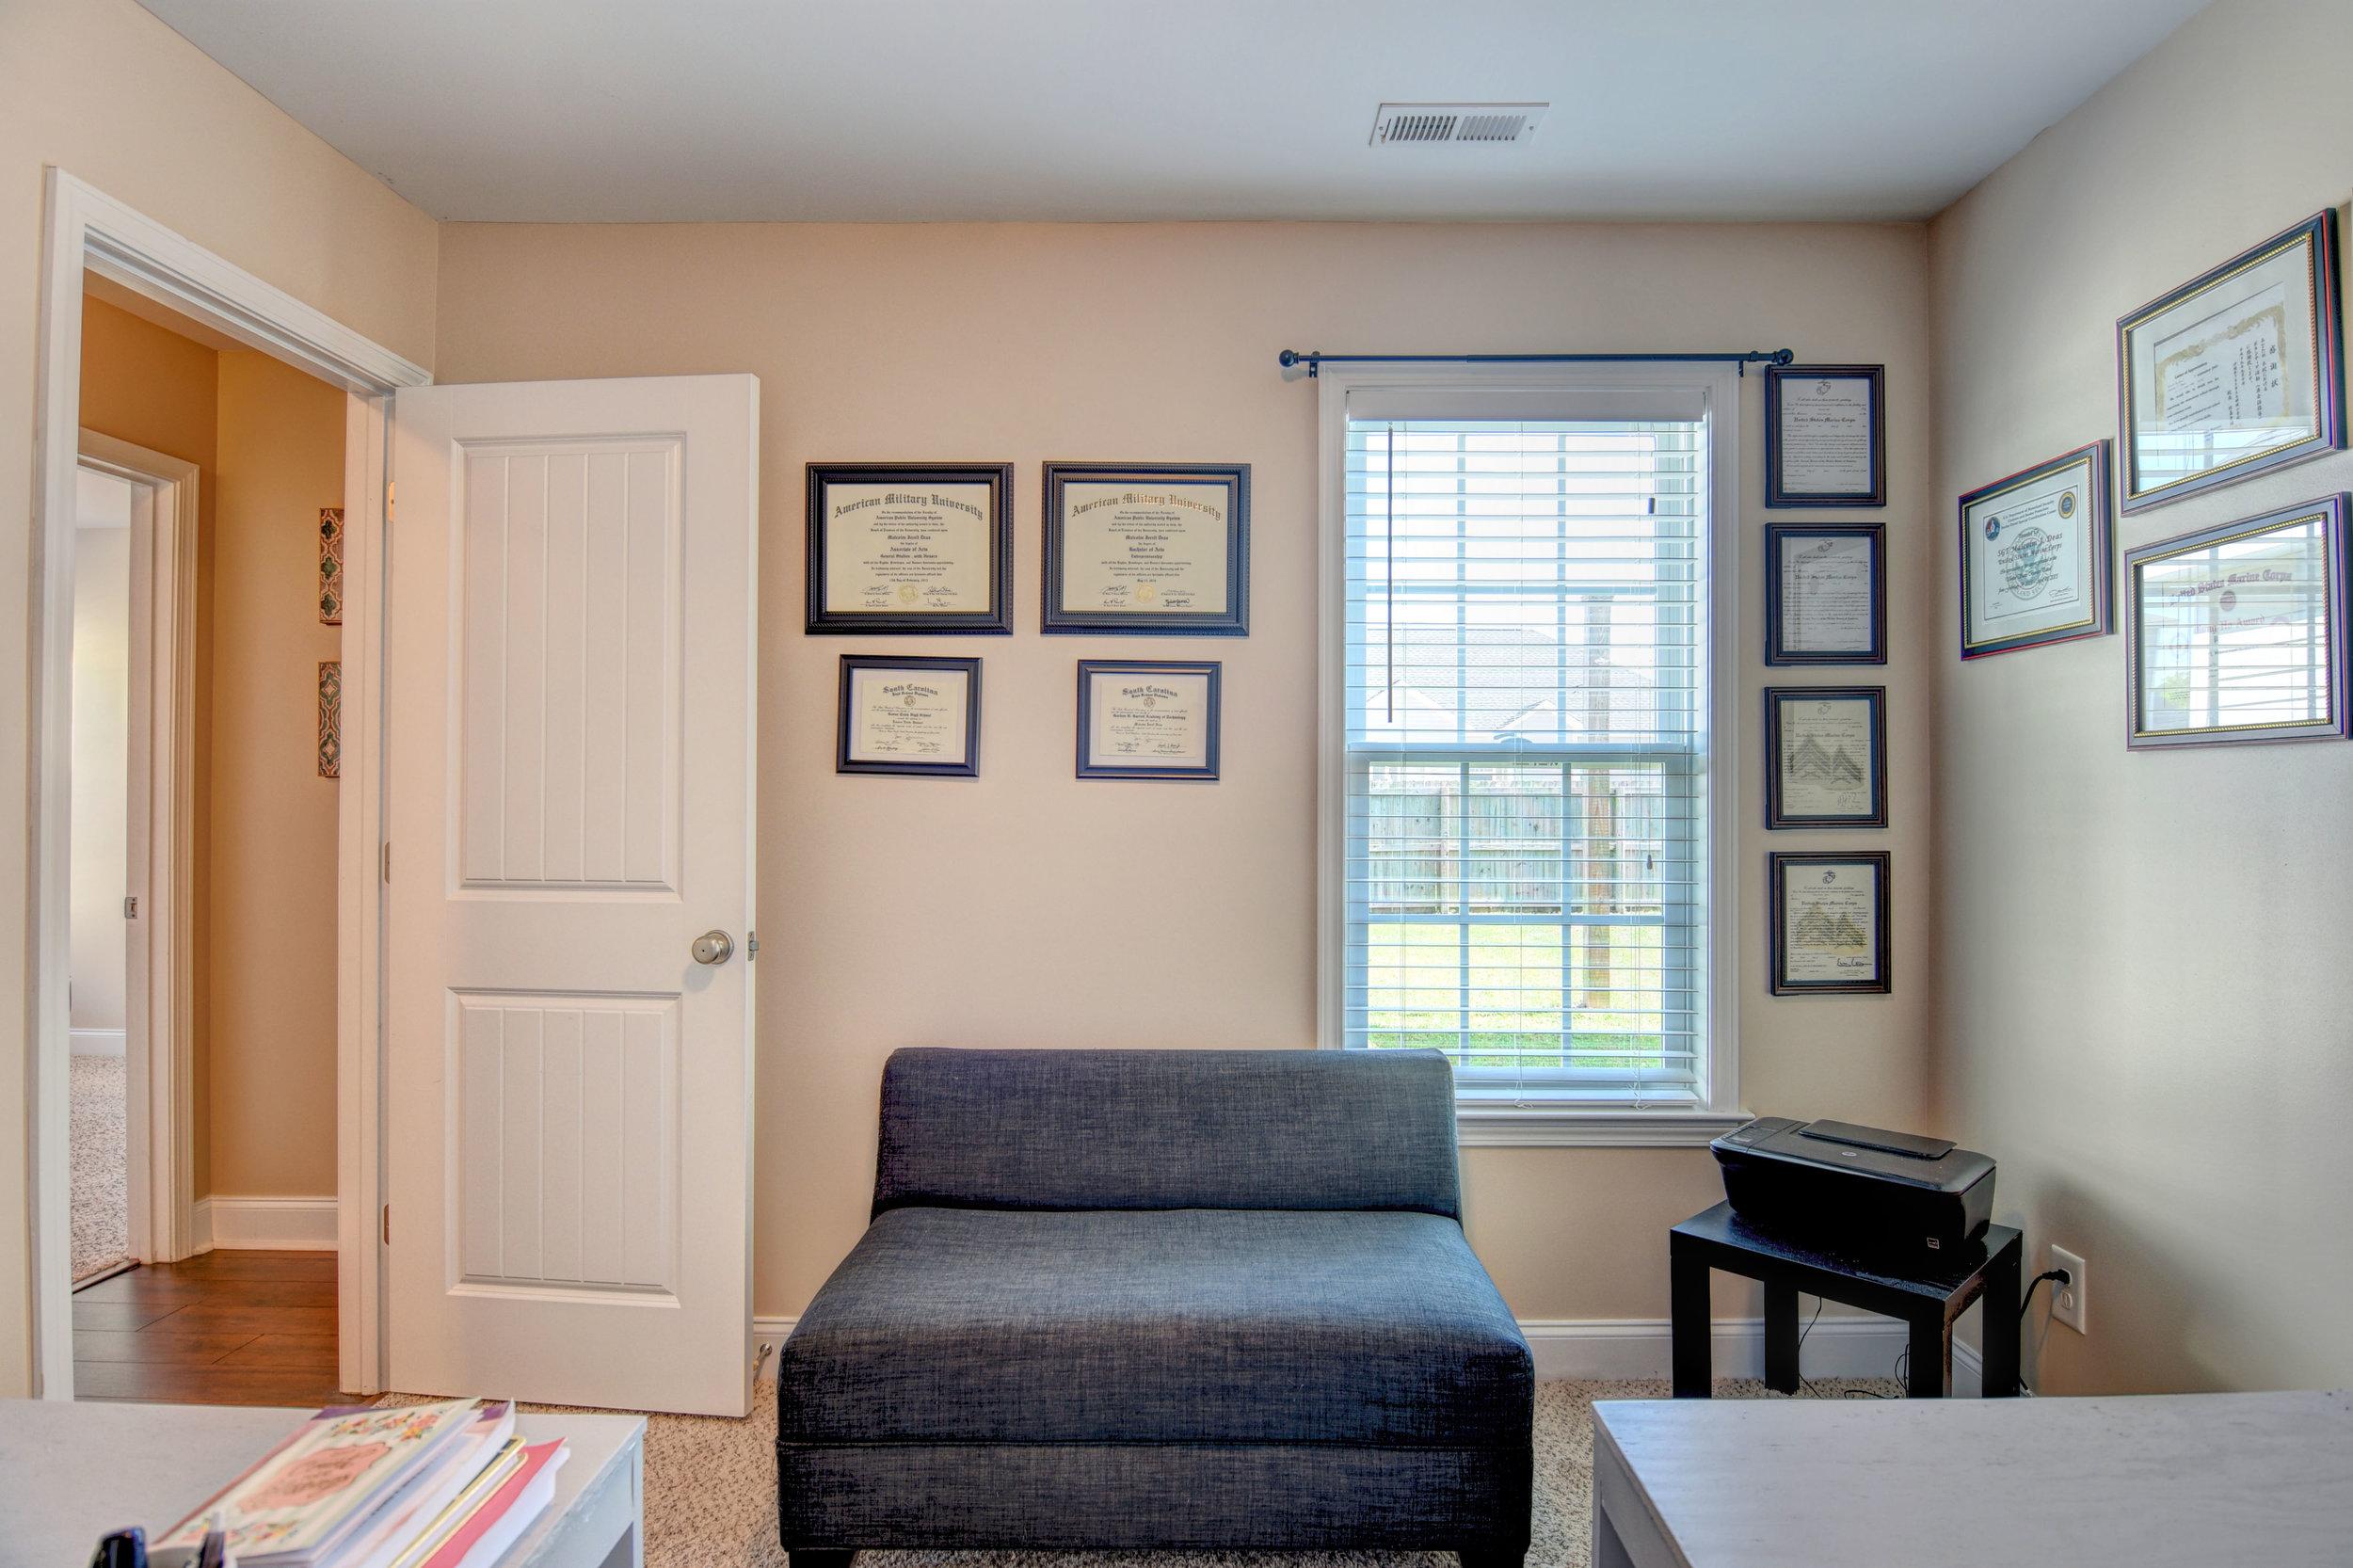 208 Riverstone Ct Jacksonville-print-024-19-DSC 7784 5 6-4200x2800-300dpi.jpg